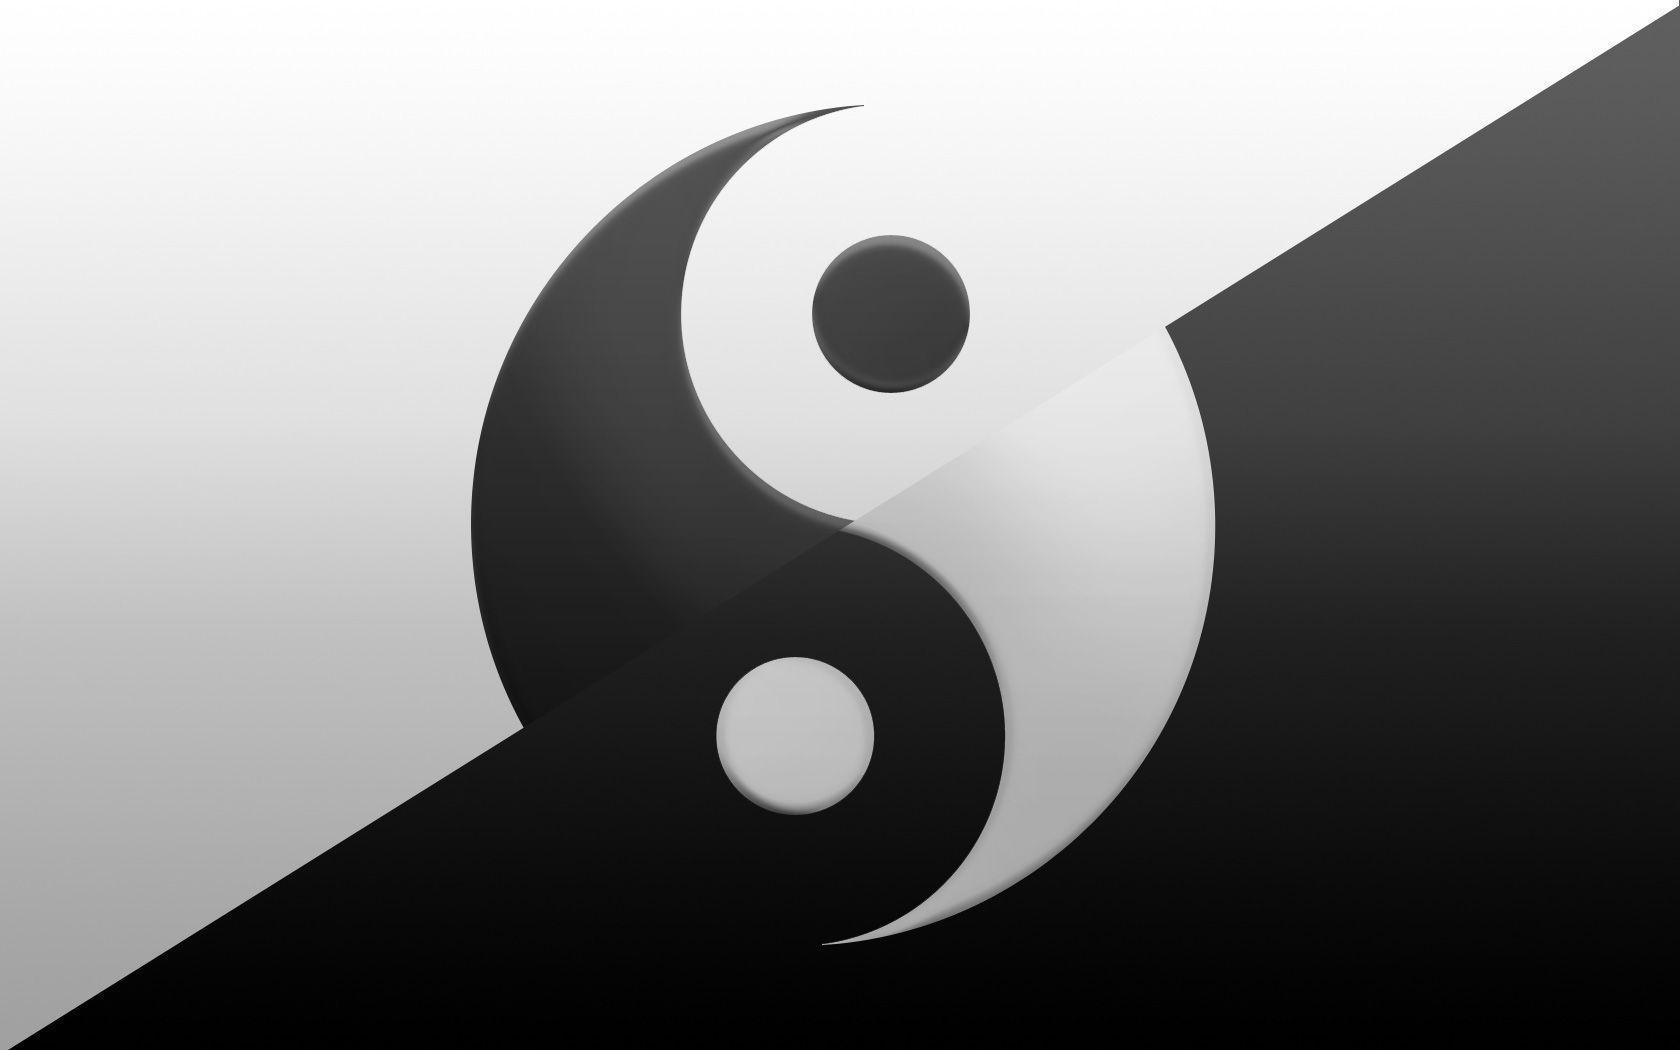 yin yang wallpapers - wallpaper cave